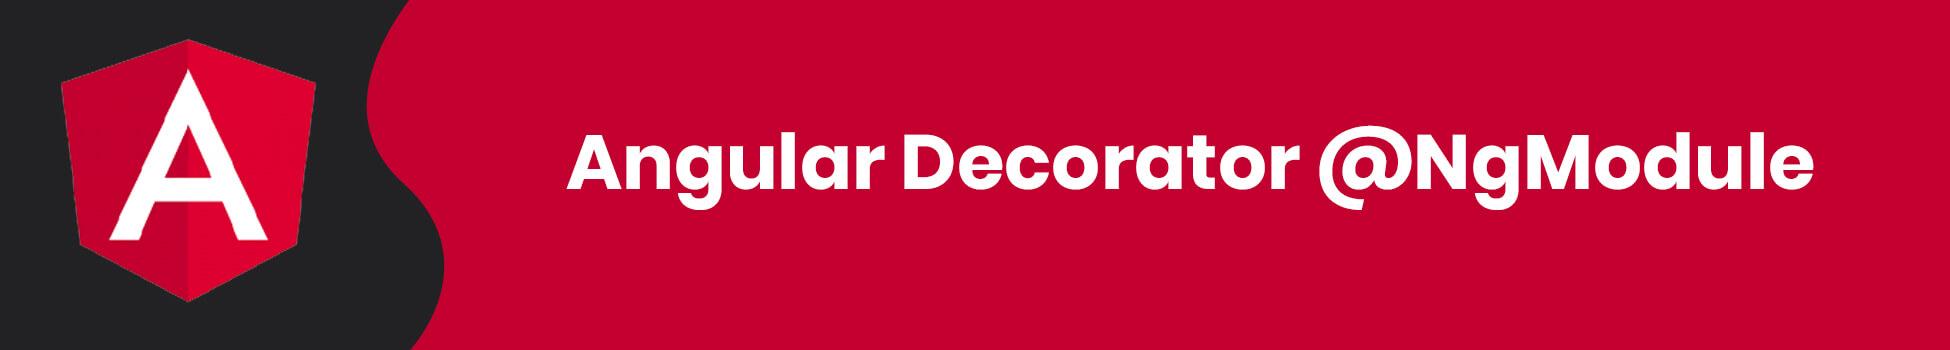 https://www.study24x7.com/article/453/angular-decorat...